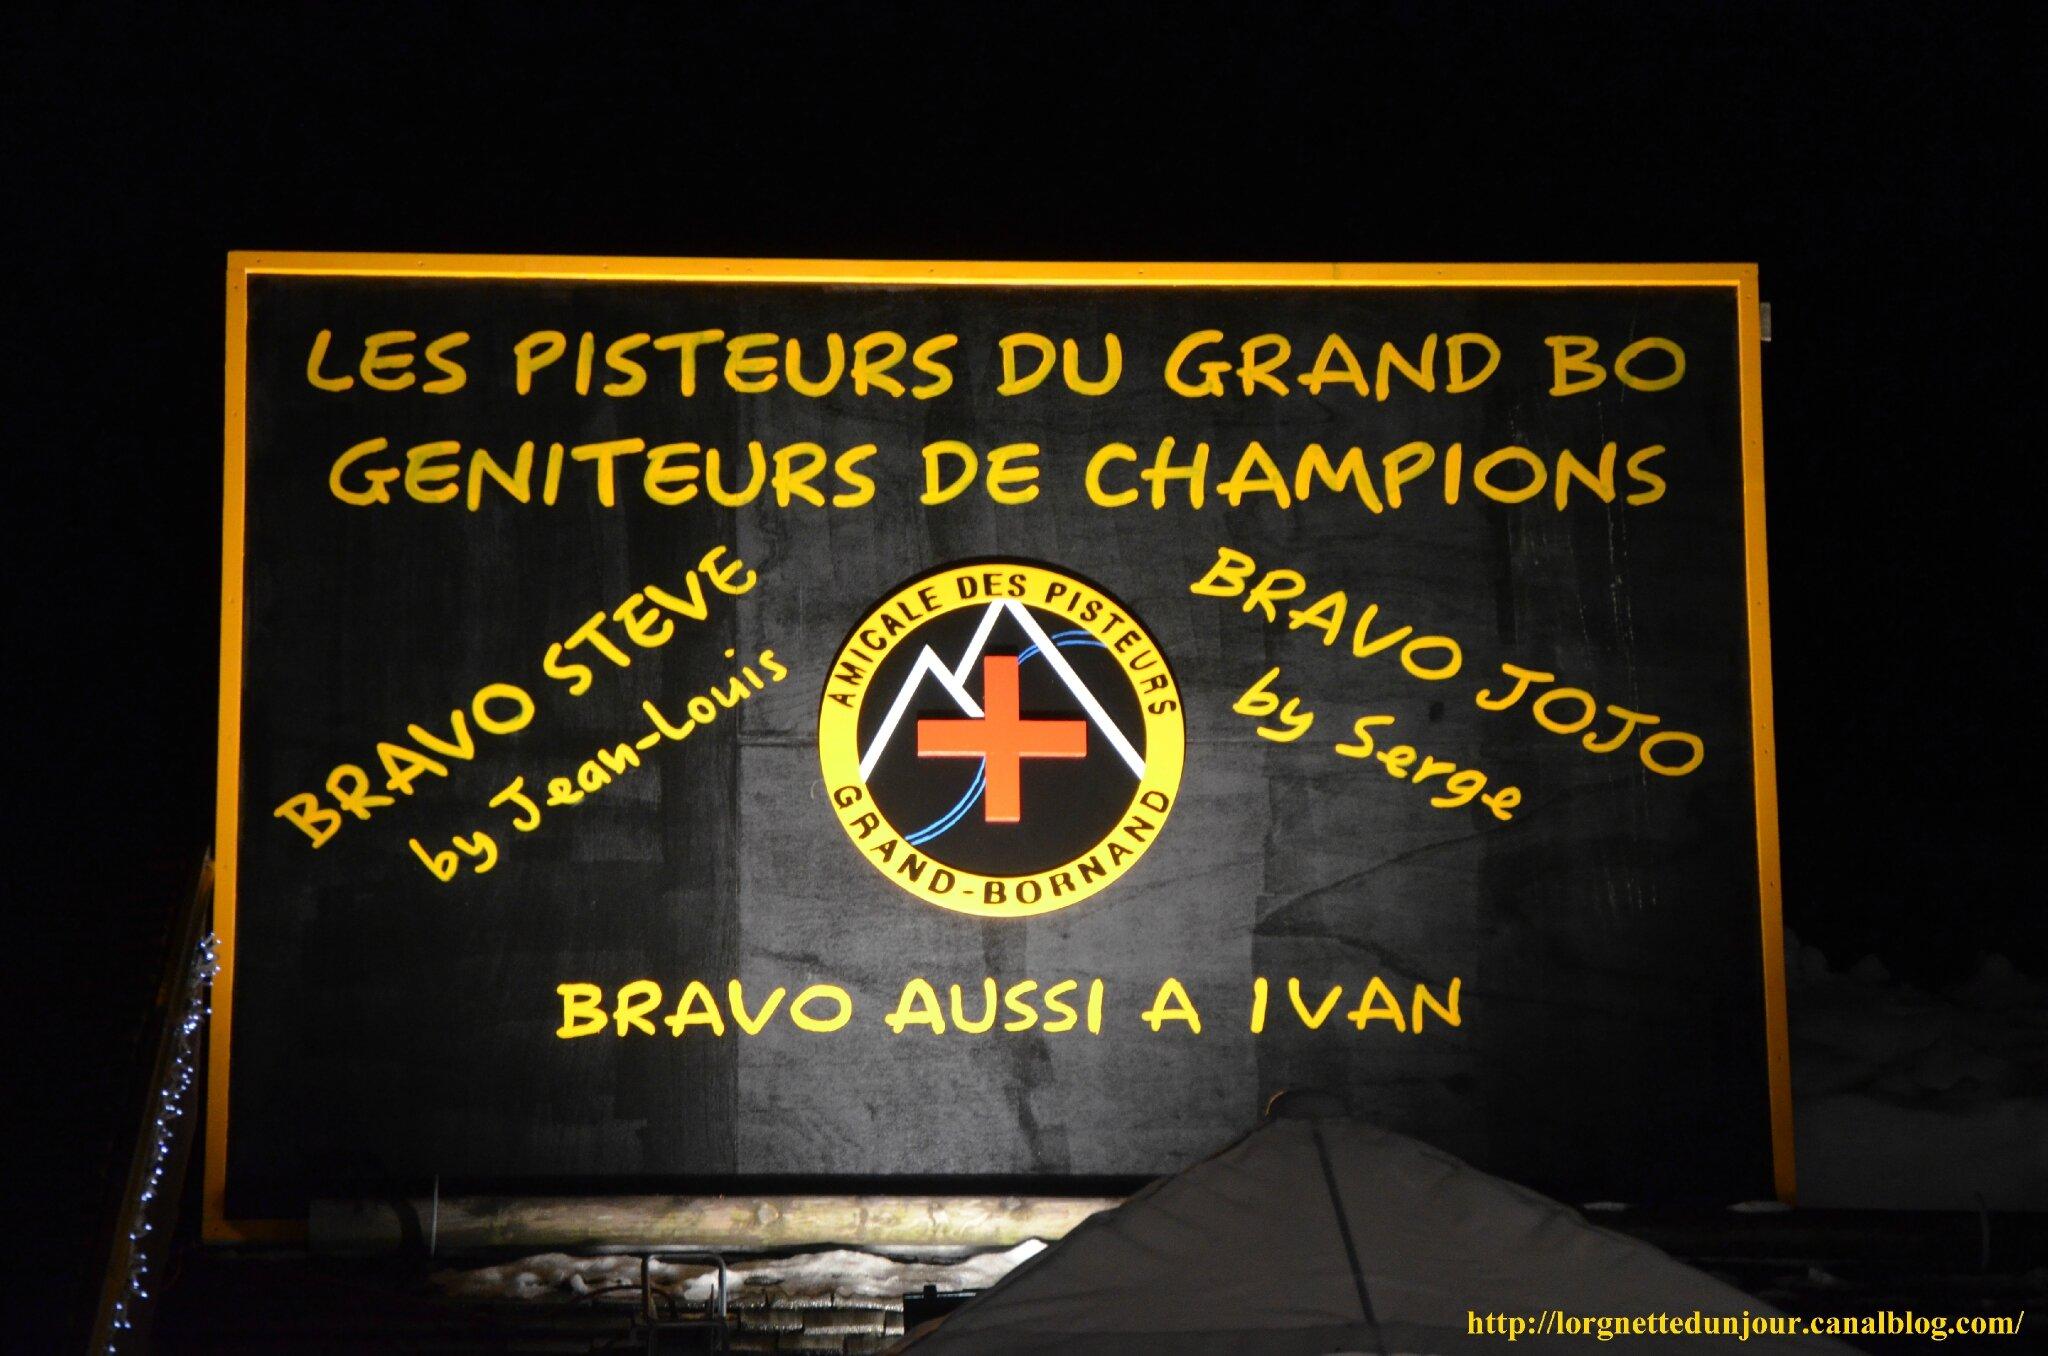 12/03/14 : Bravo les champions